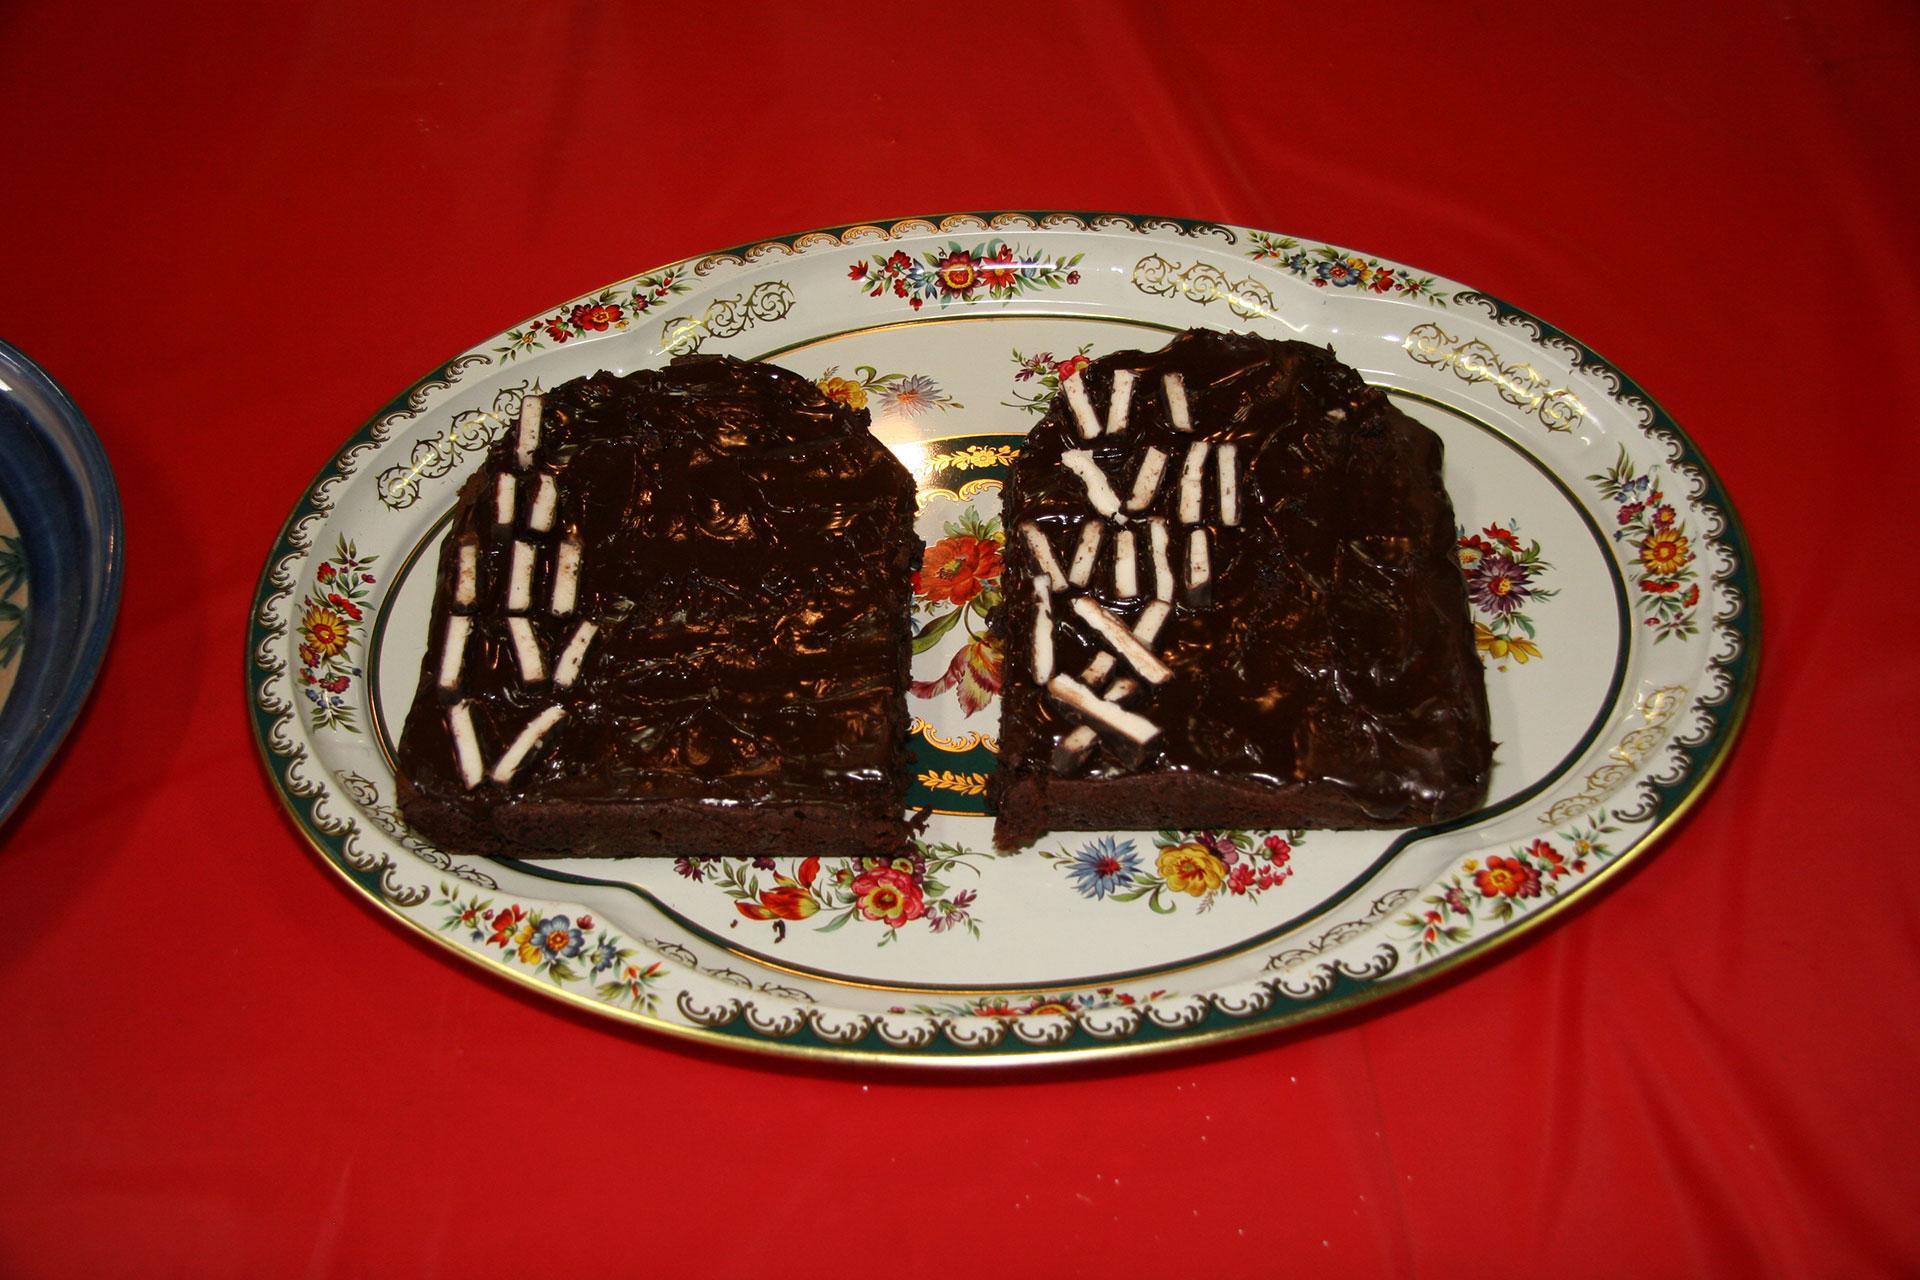 """Ten Commandmint Brownies"" created by Linda Mah and the Bus Up Roadies; 2011 KBAC Edible Book entry"